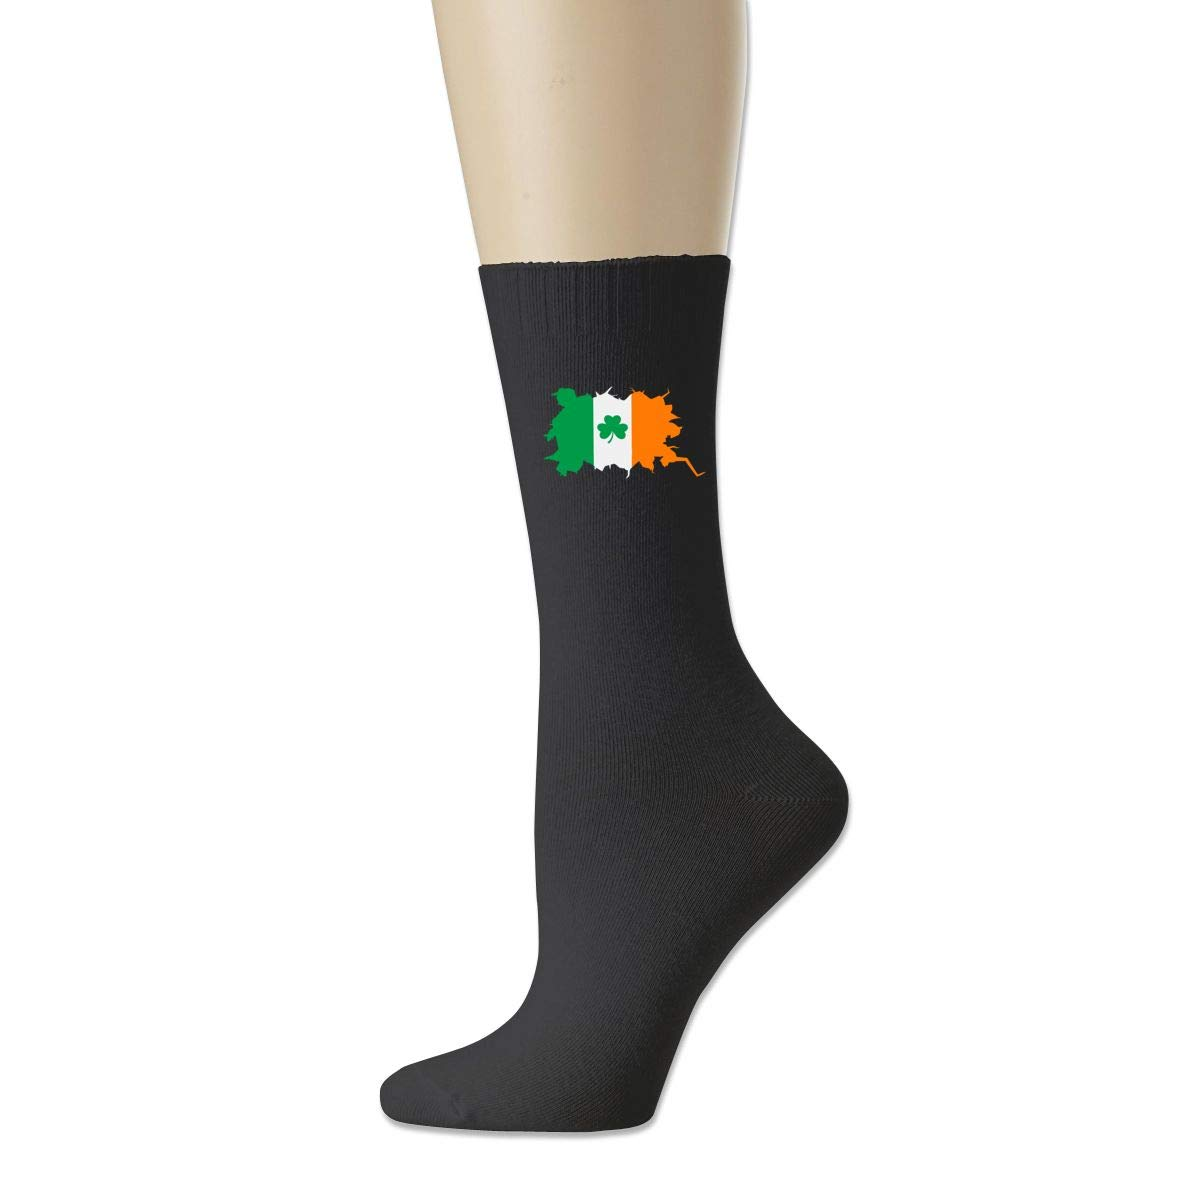 Shamrock Ireland Irish Flag Cotton Crew Bobbysox Ski Socks Unisex Soccer Socks